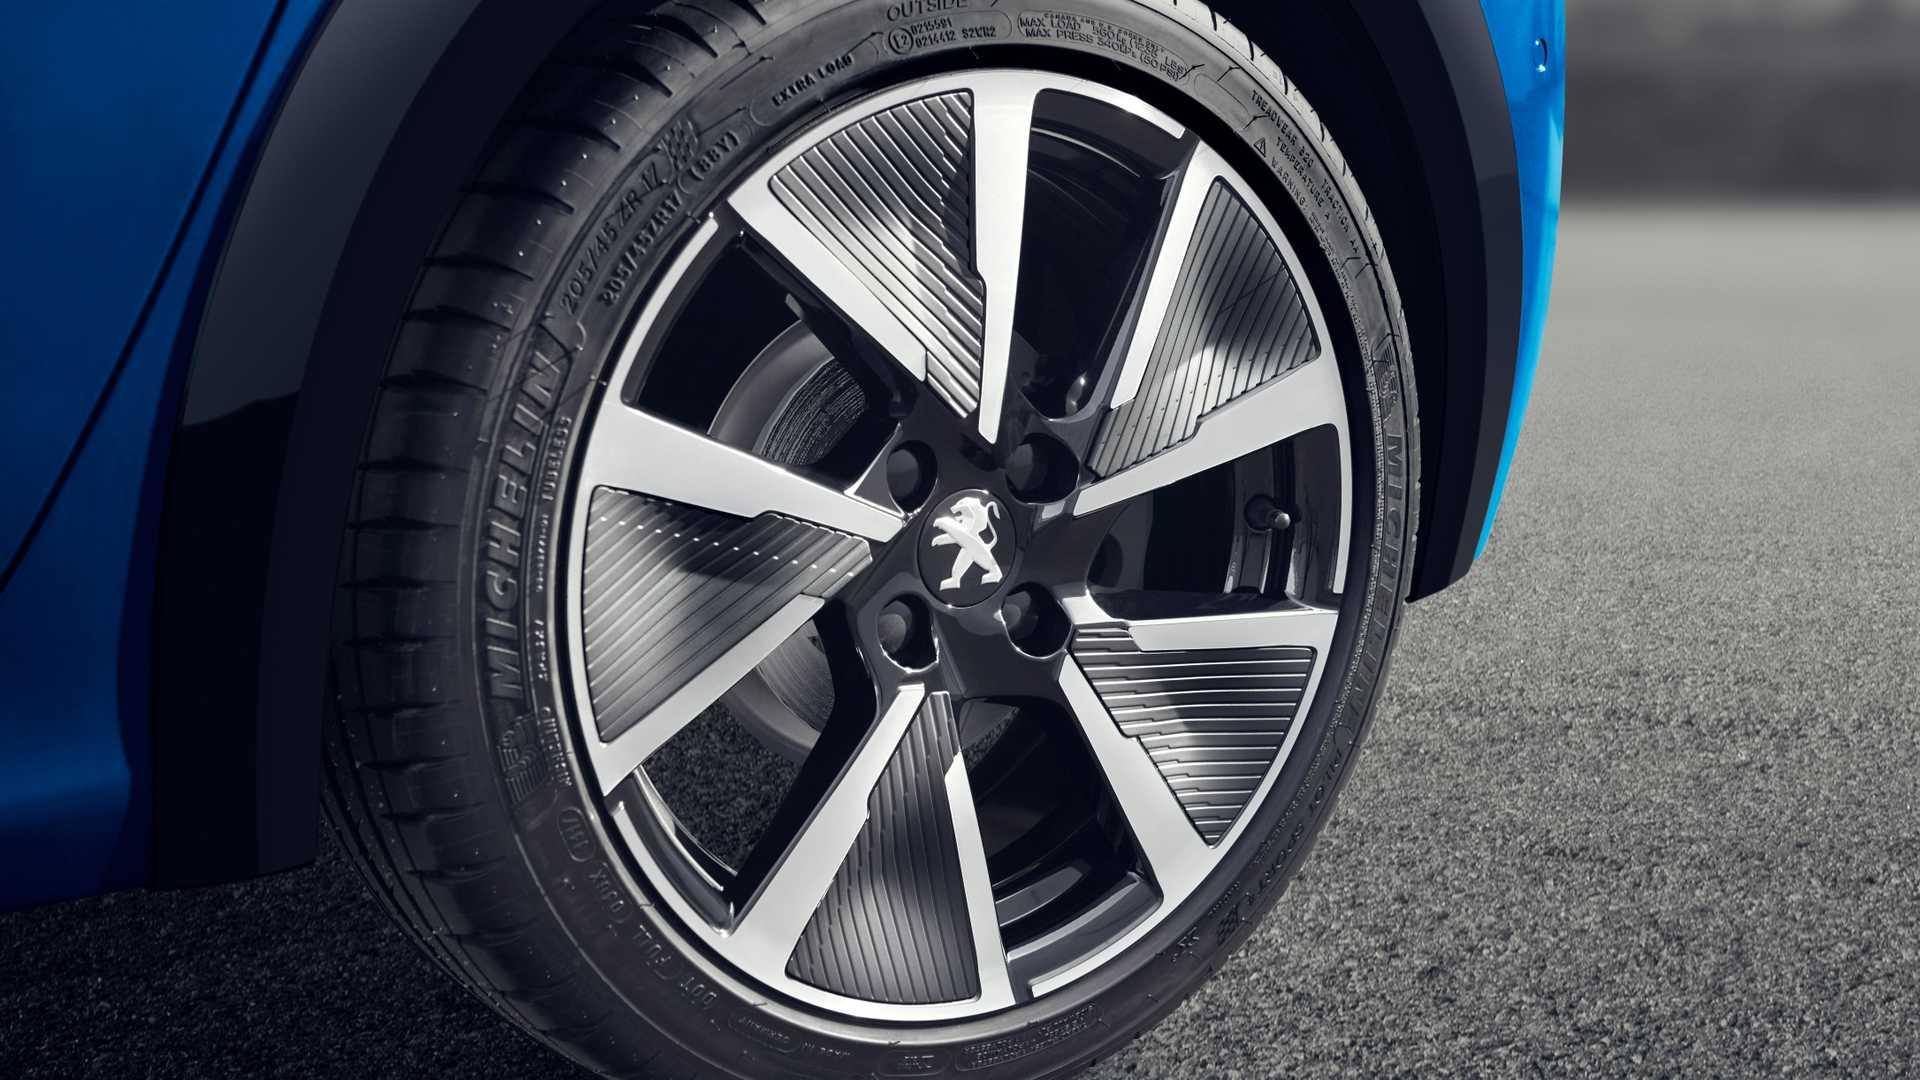 2020 Peugeot e-208 EV Wheel Wallpaper (13)